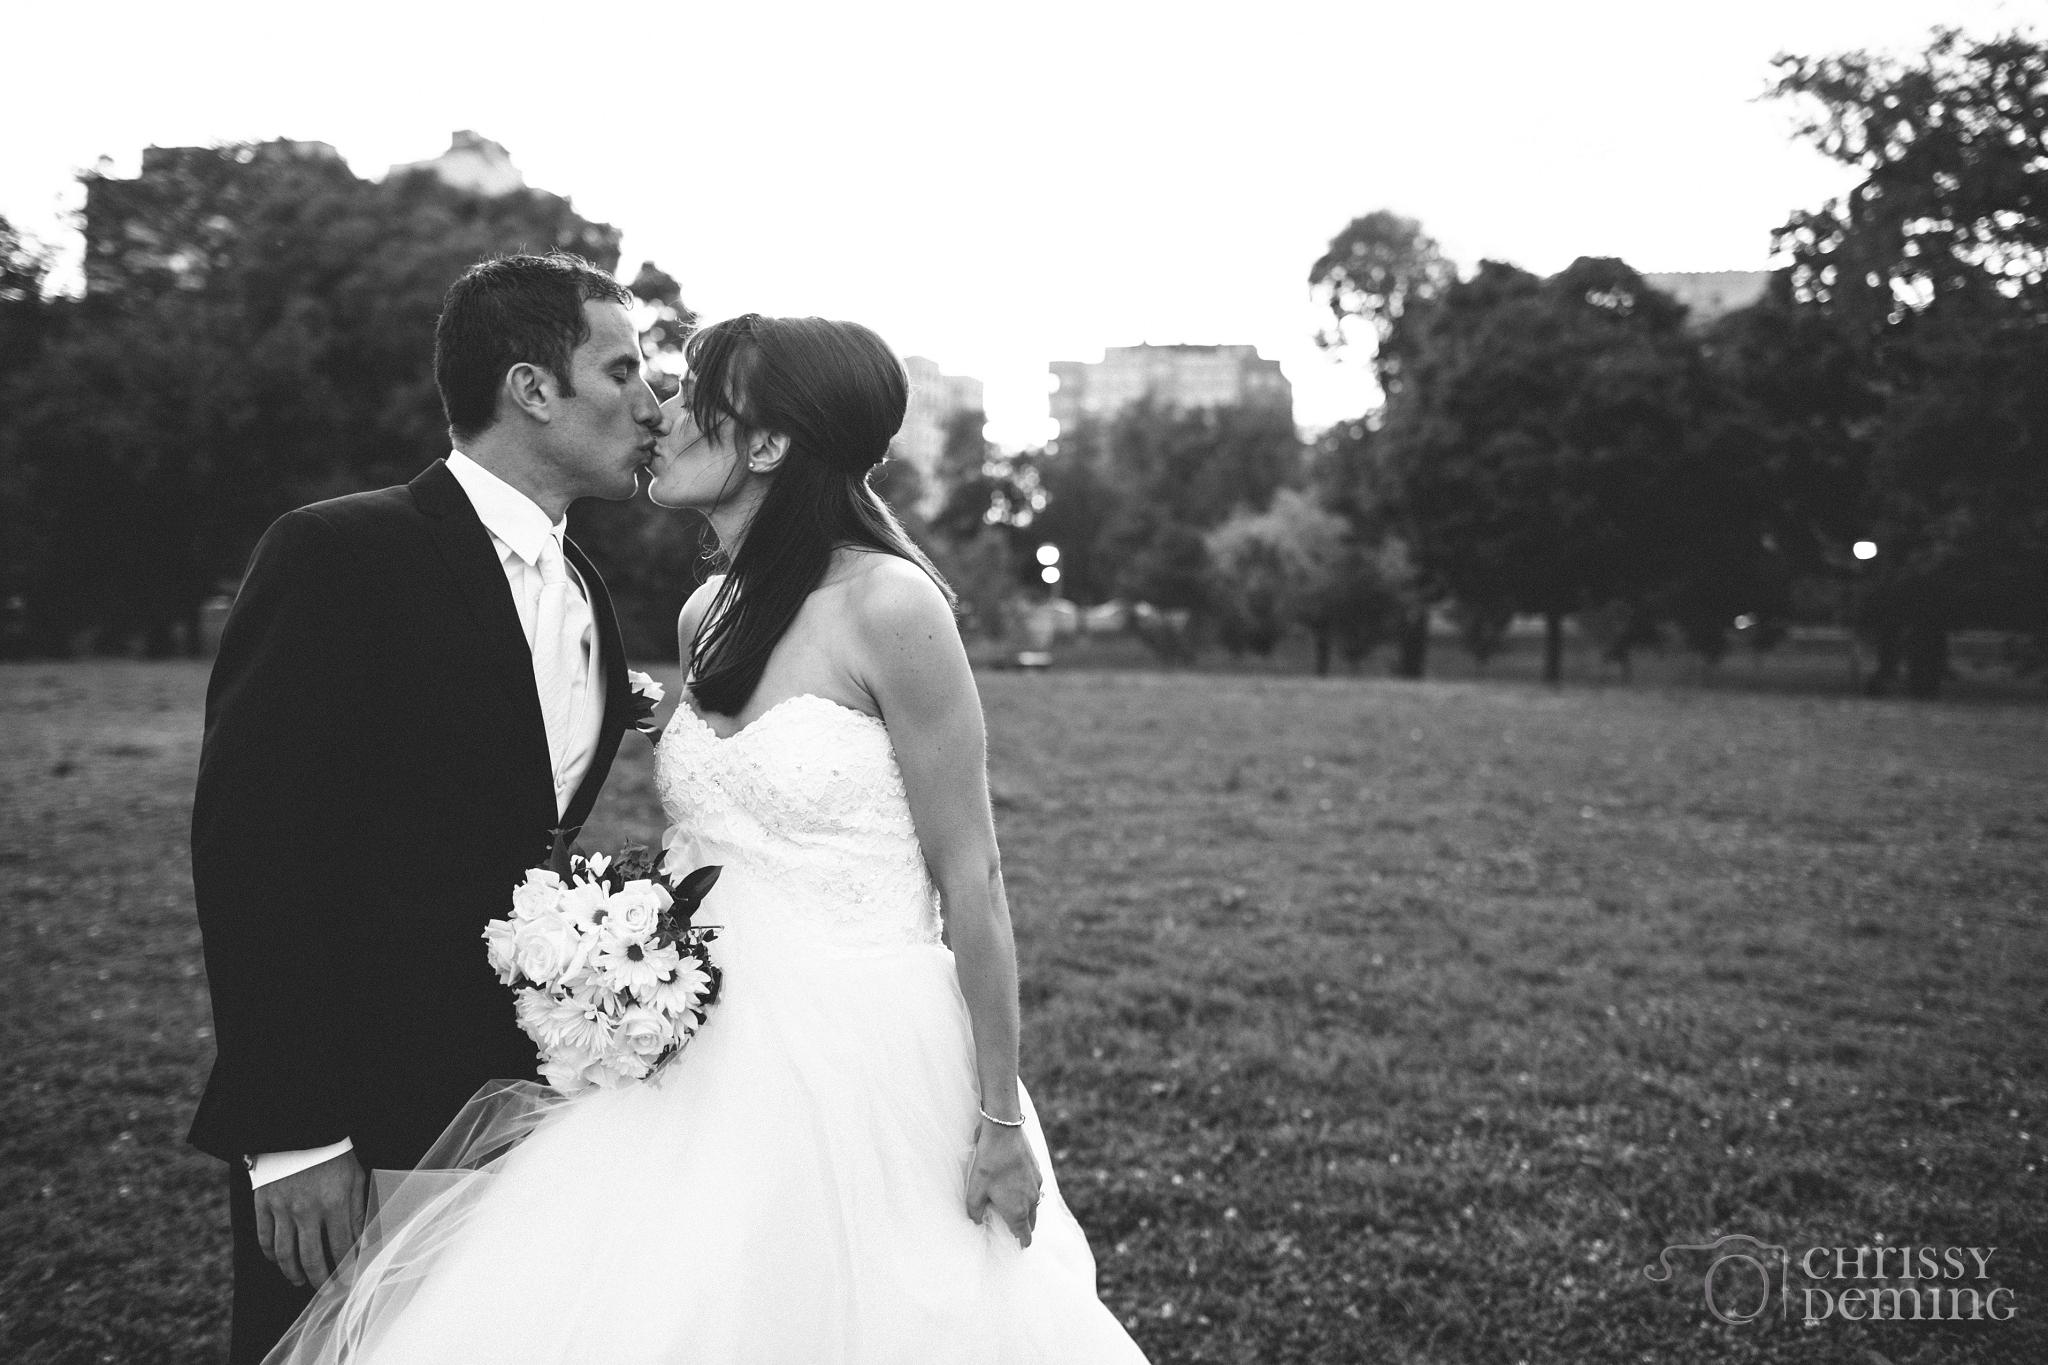 promontory_point_chicago_wedding_photography_0029.jpg